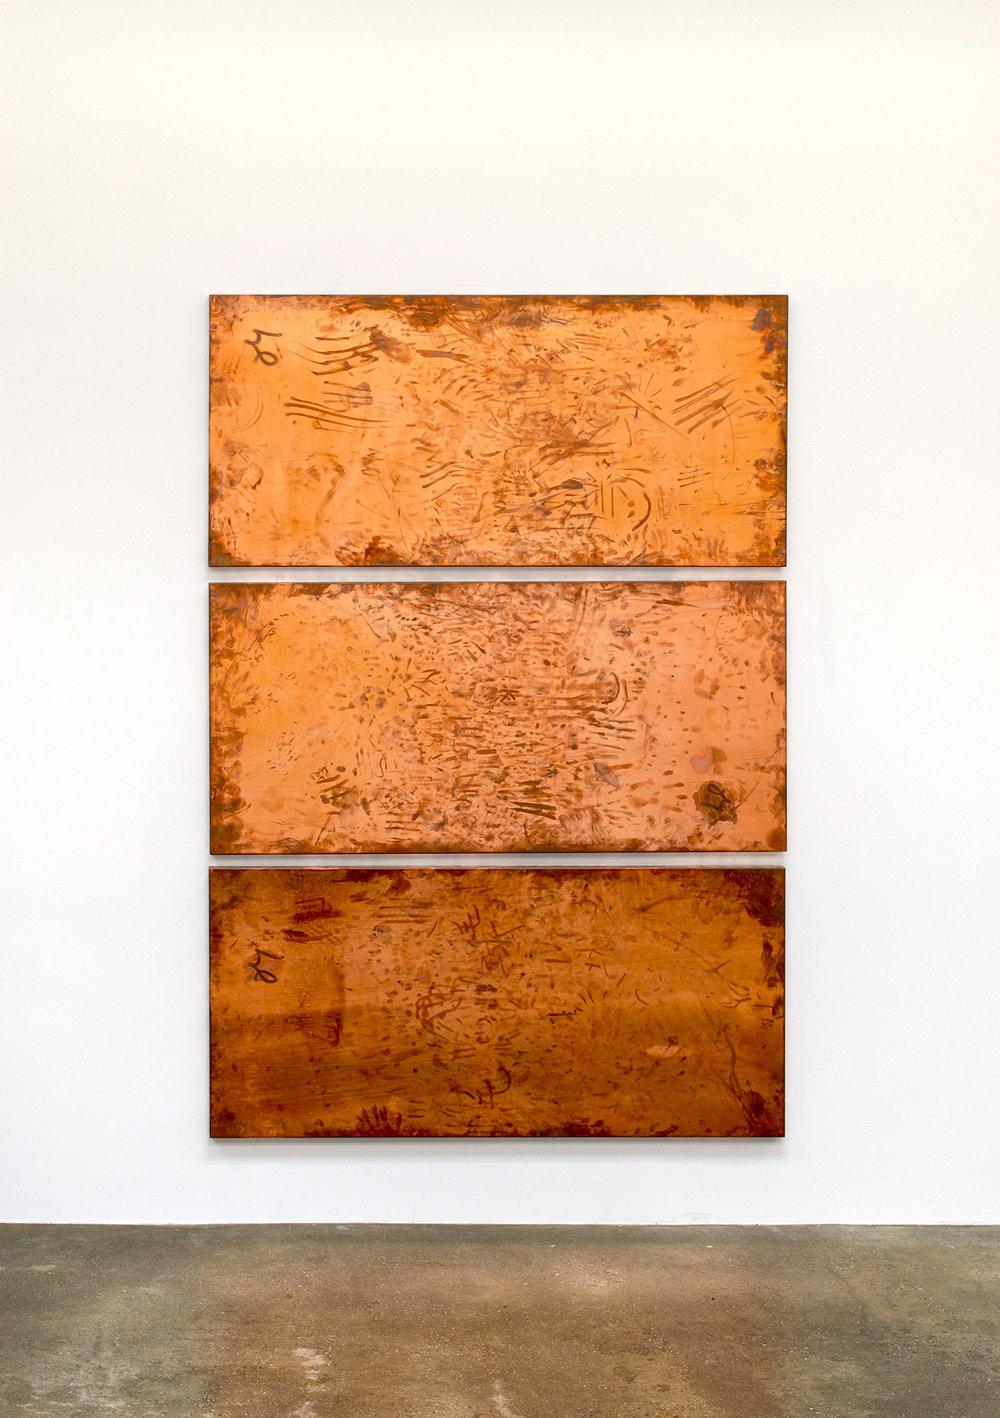 Copper Surrogates (September 20–23/November 21–23, 2011, Beijing, China, June 13–18/November 21, 2012Los Angeles, California, November 29–December 3, 2012, Miami Beach, Florida)   2011–  Polished copper  35 1/2 x 74 3/4 x 1 1/2 inches each   Surrogates (Full Sheet, Art Handling), 2011–    The Endless Renaissance, 2012